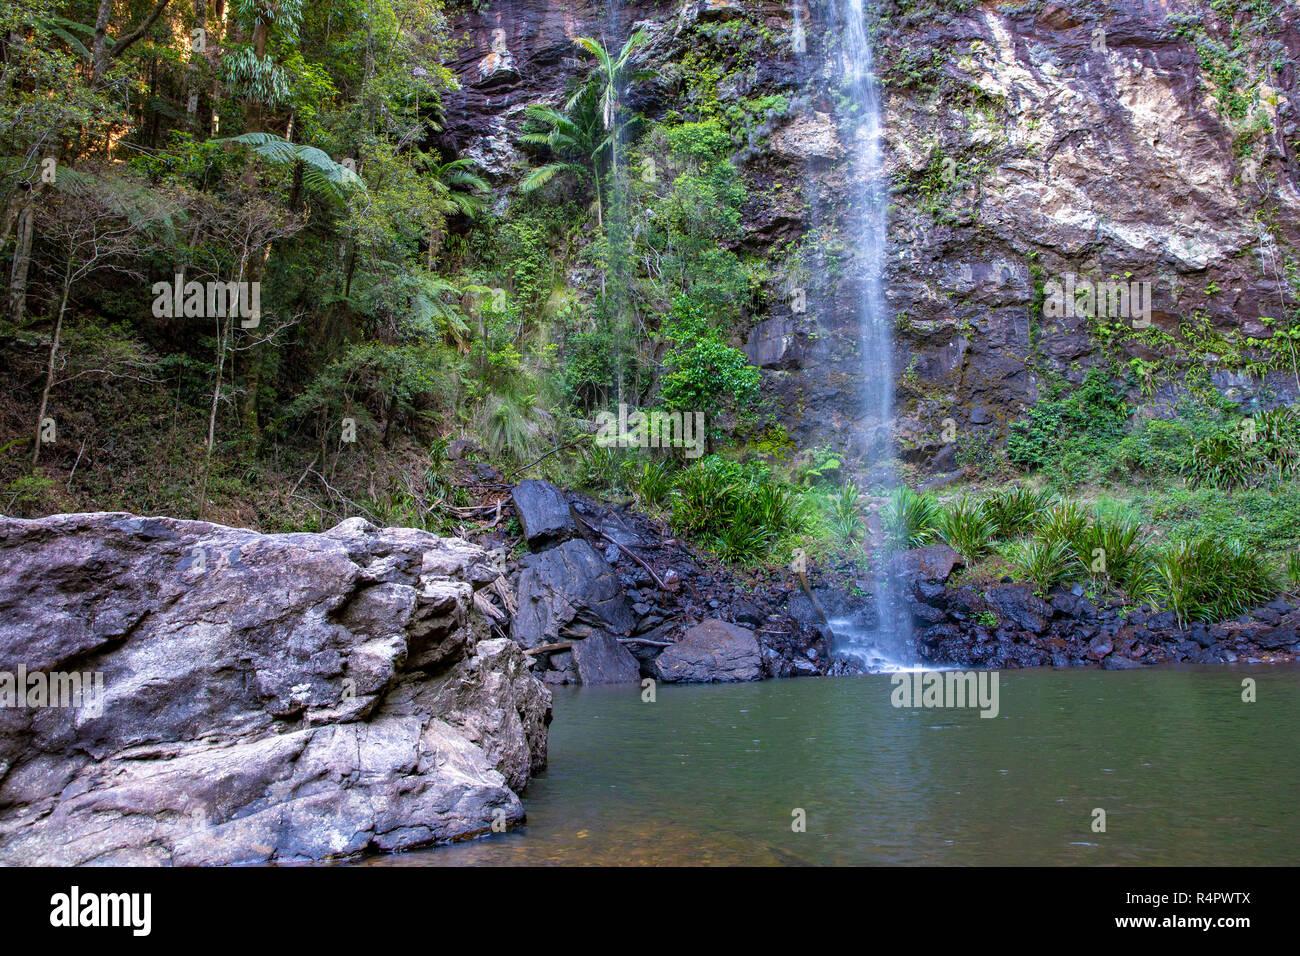 Twin falls circuit and waterfall in Springbrook national